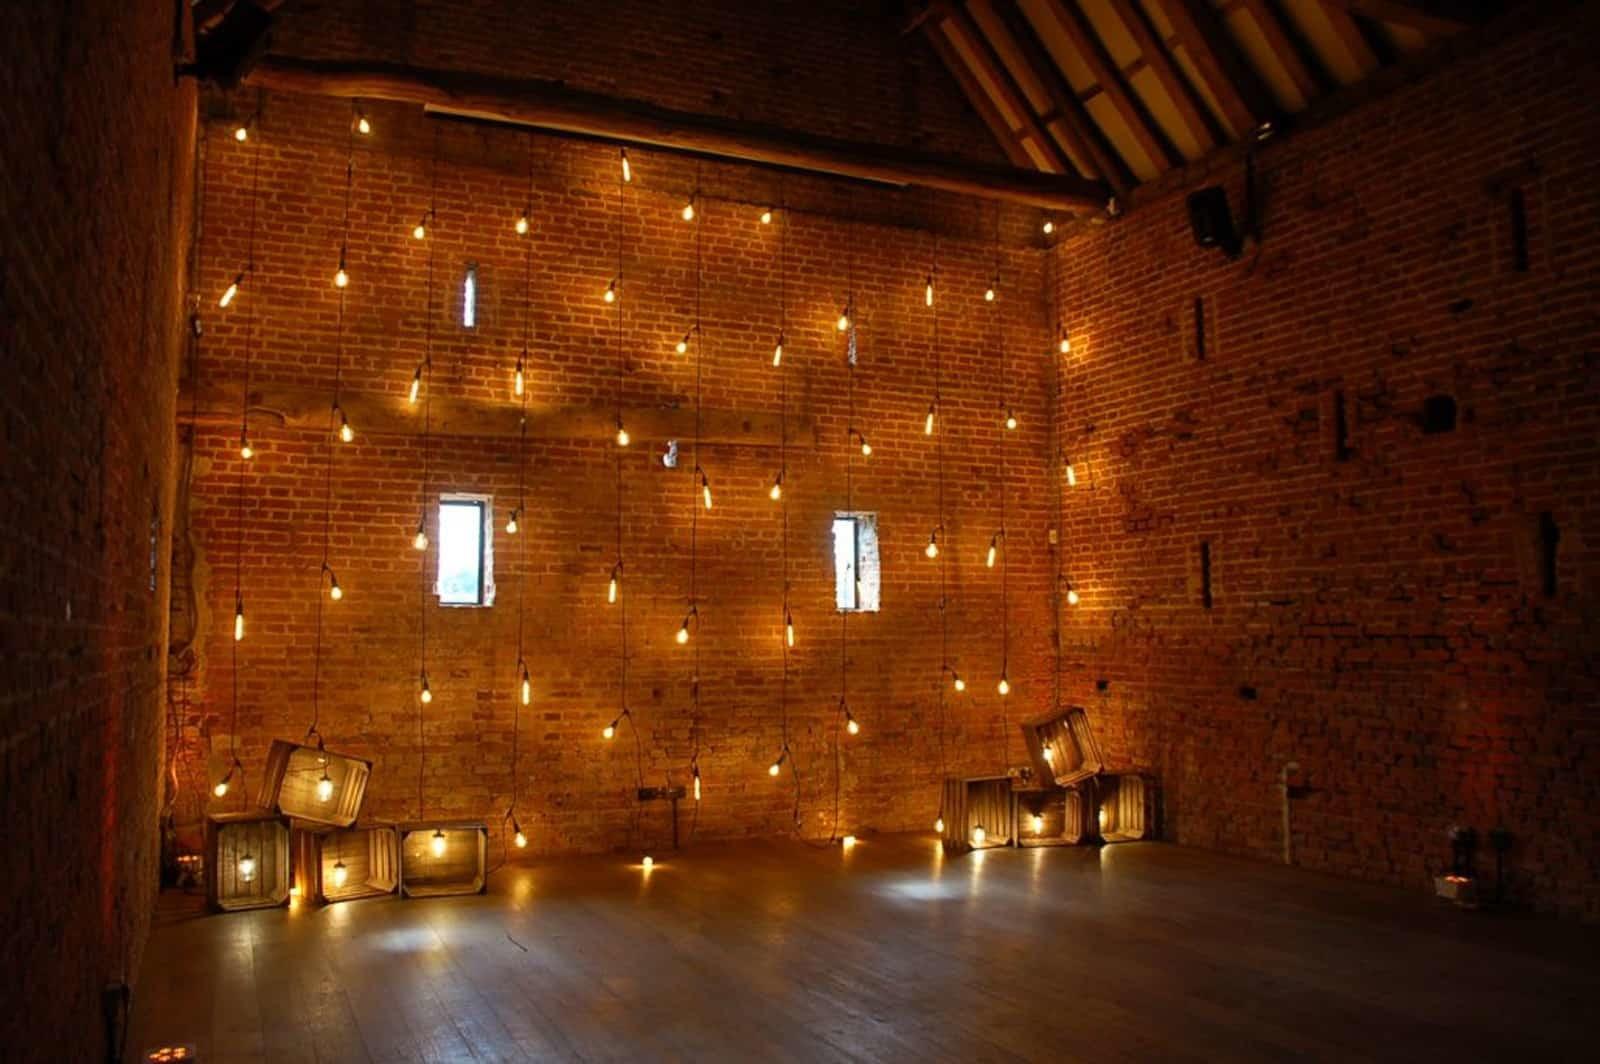 Wall of lighting at Copdock Hall